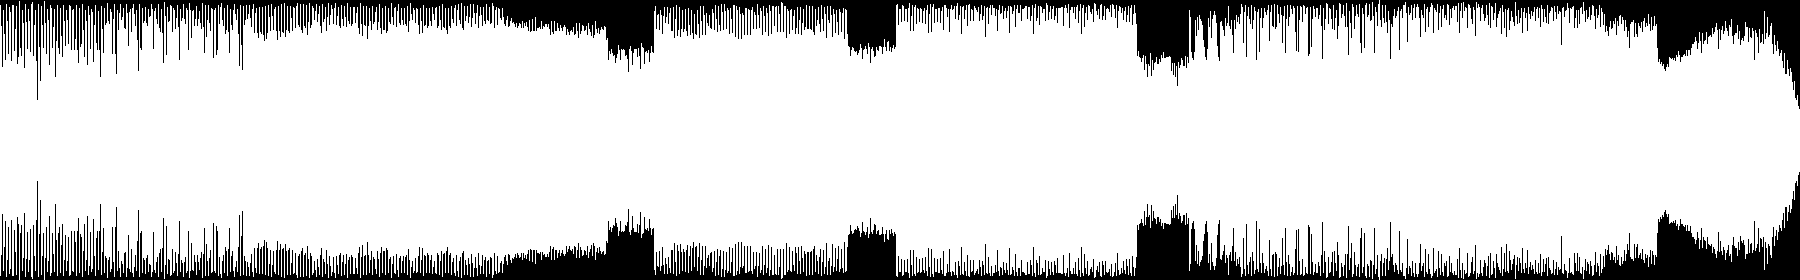 Digital Disco audio waveform